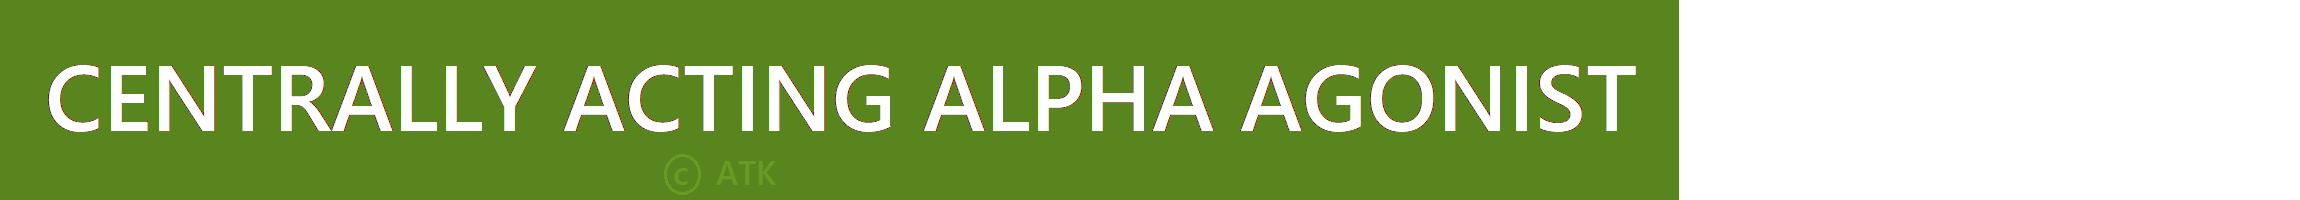 Alpha Agonist high blood pressure in CKD treatment www.allthingskidney.com